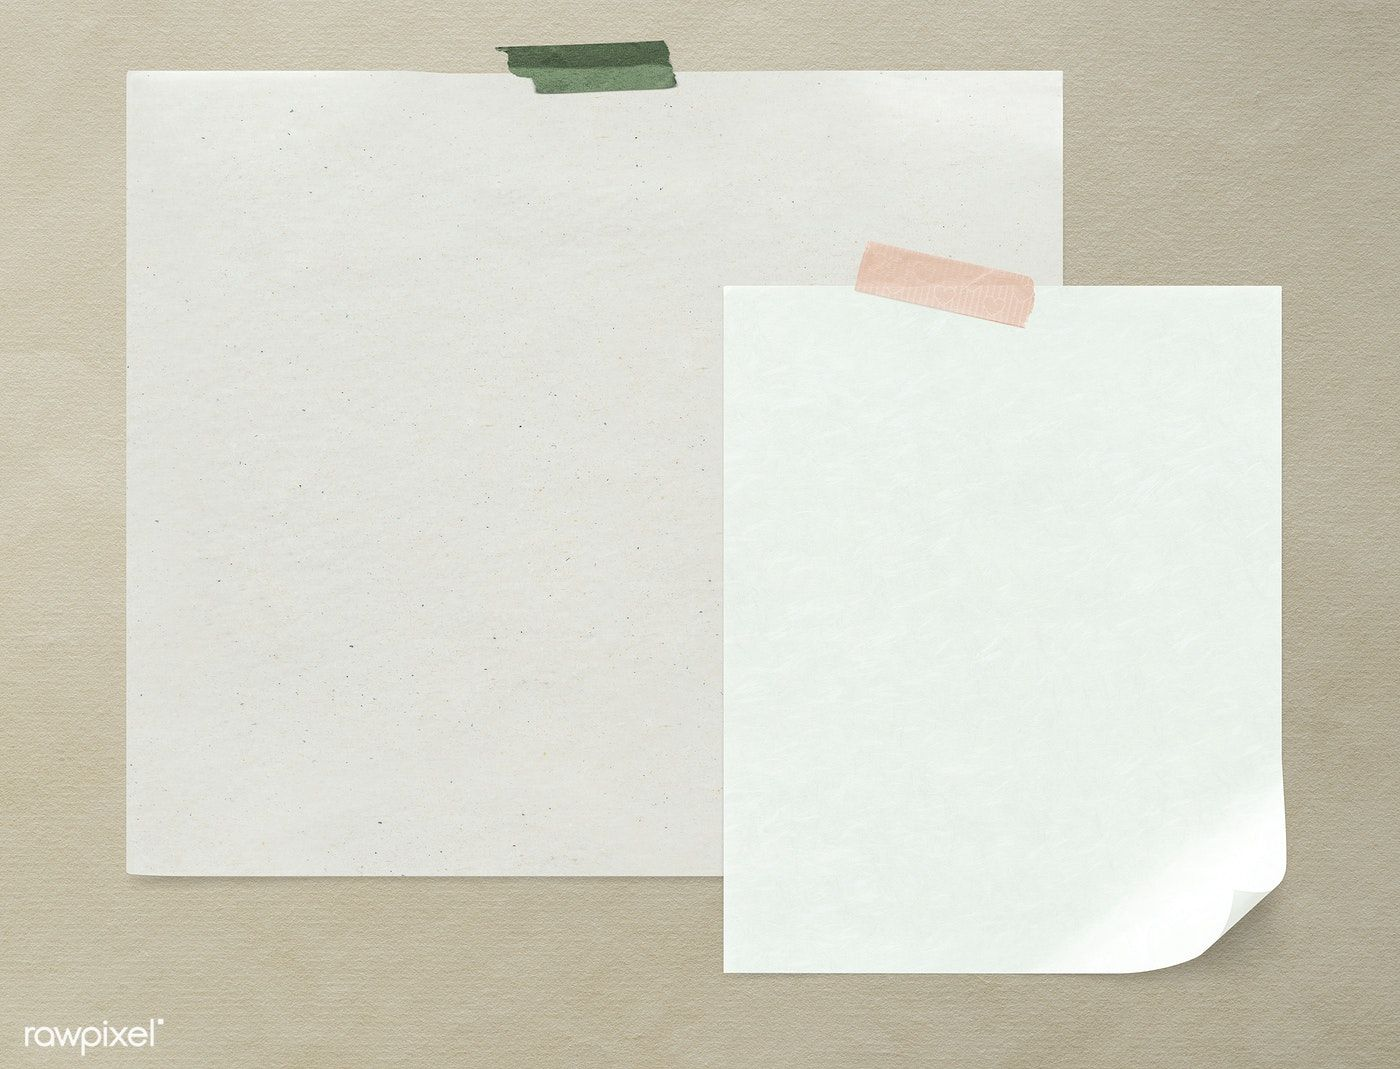 Download Premium Psd Of Blank Plain White Paper Template 1201859 Paper Template White Paper Paper